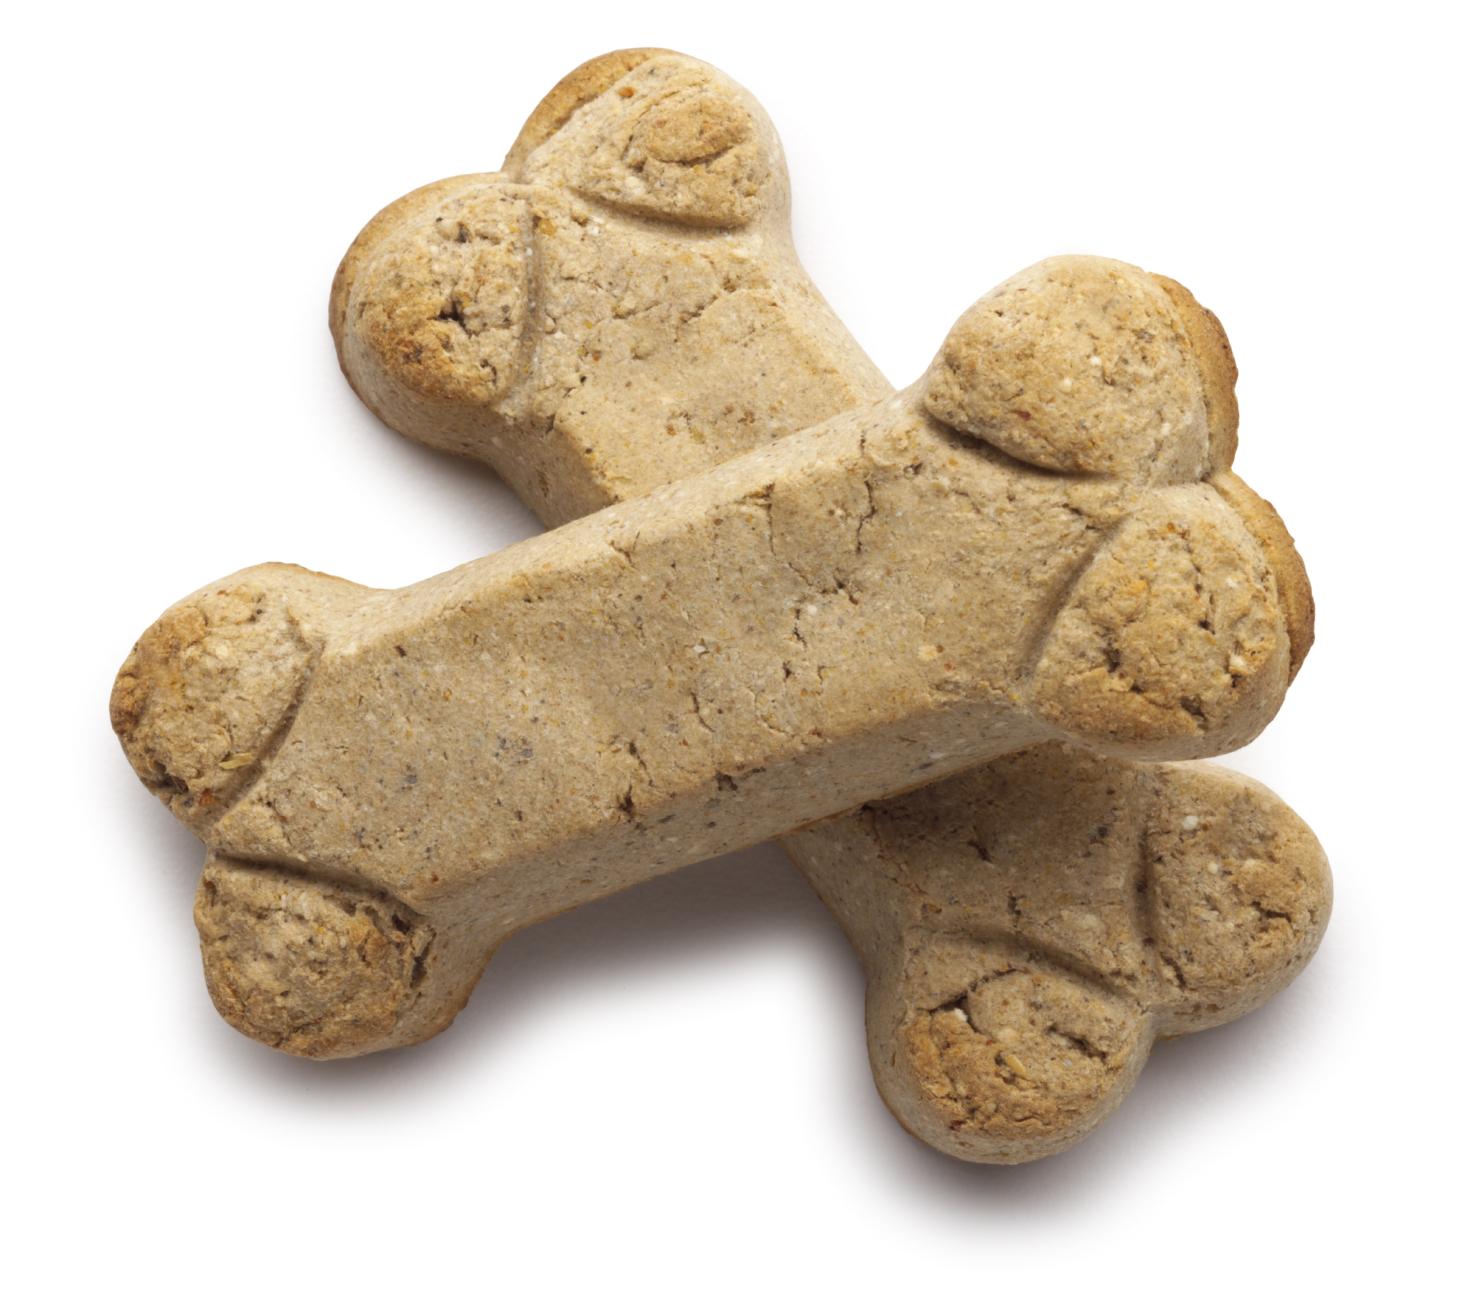 Nearly 1,000 dogs now sick from jerky treats, FDA reports say.